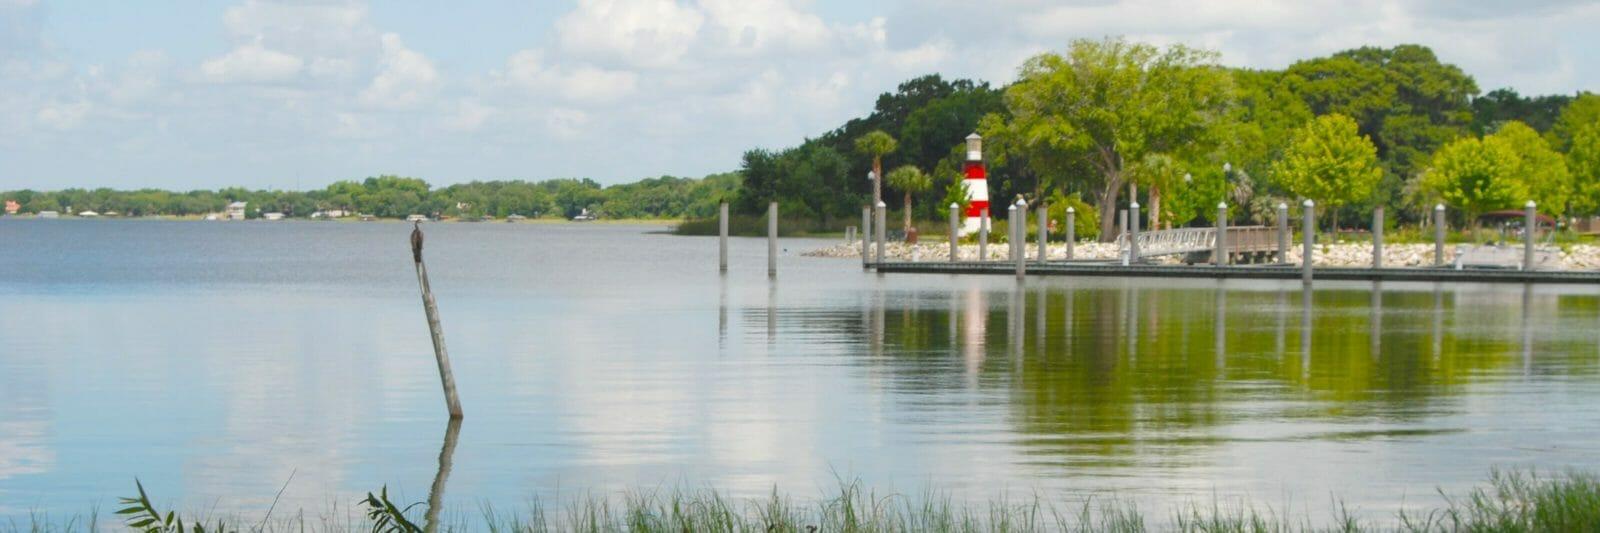 Lake Dora lighthouse